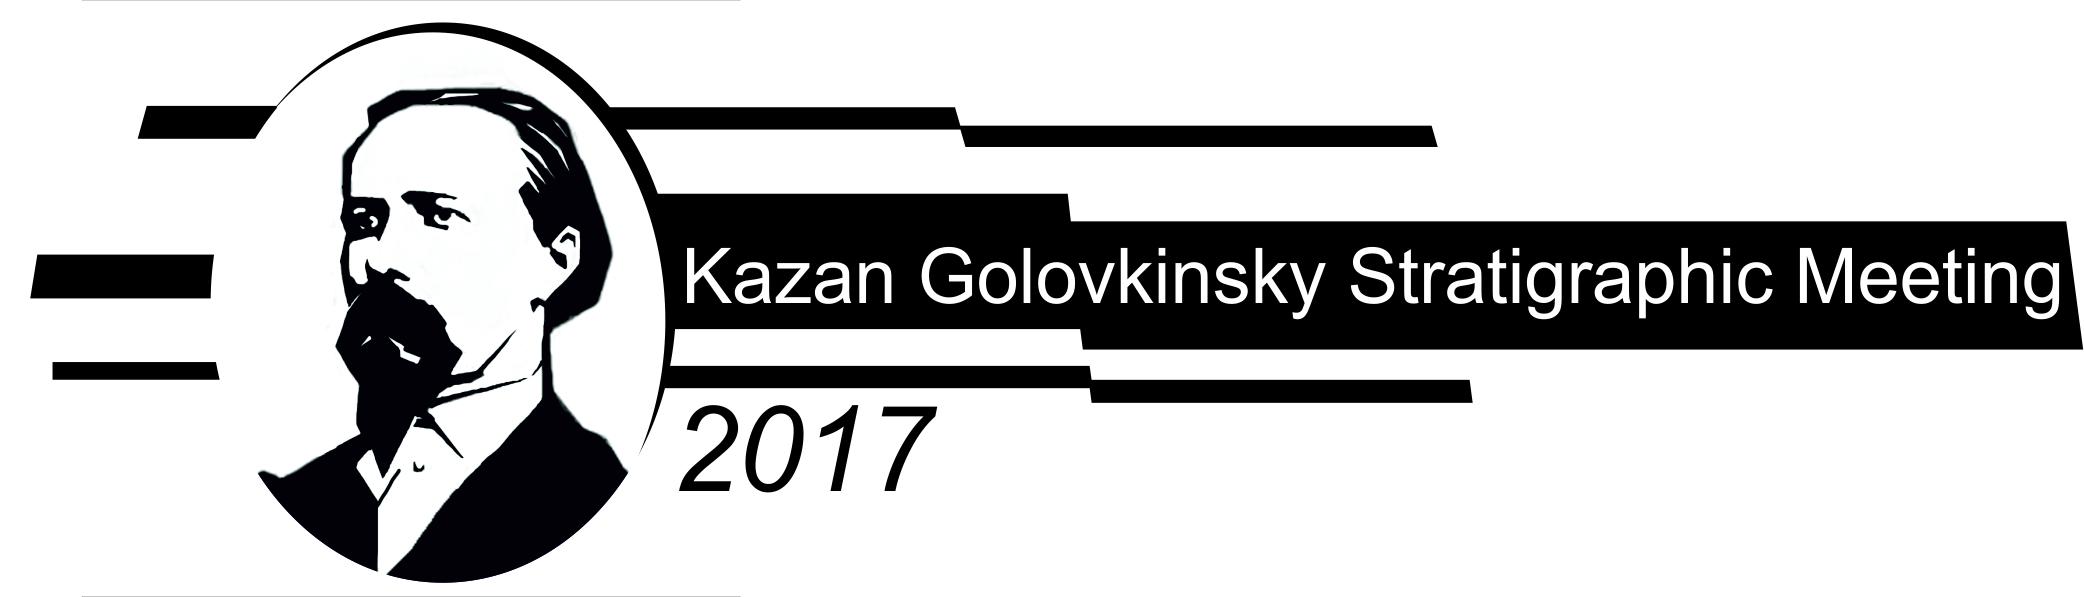 Портал КФУ \ Academic Units \ Natural Sciences \ Institute of Geology and Petroleum Technologies \ Kazan Golovkinsky Stratigraphic Meeting